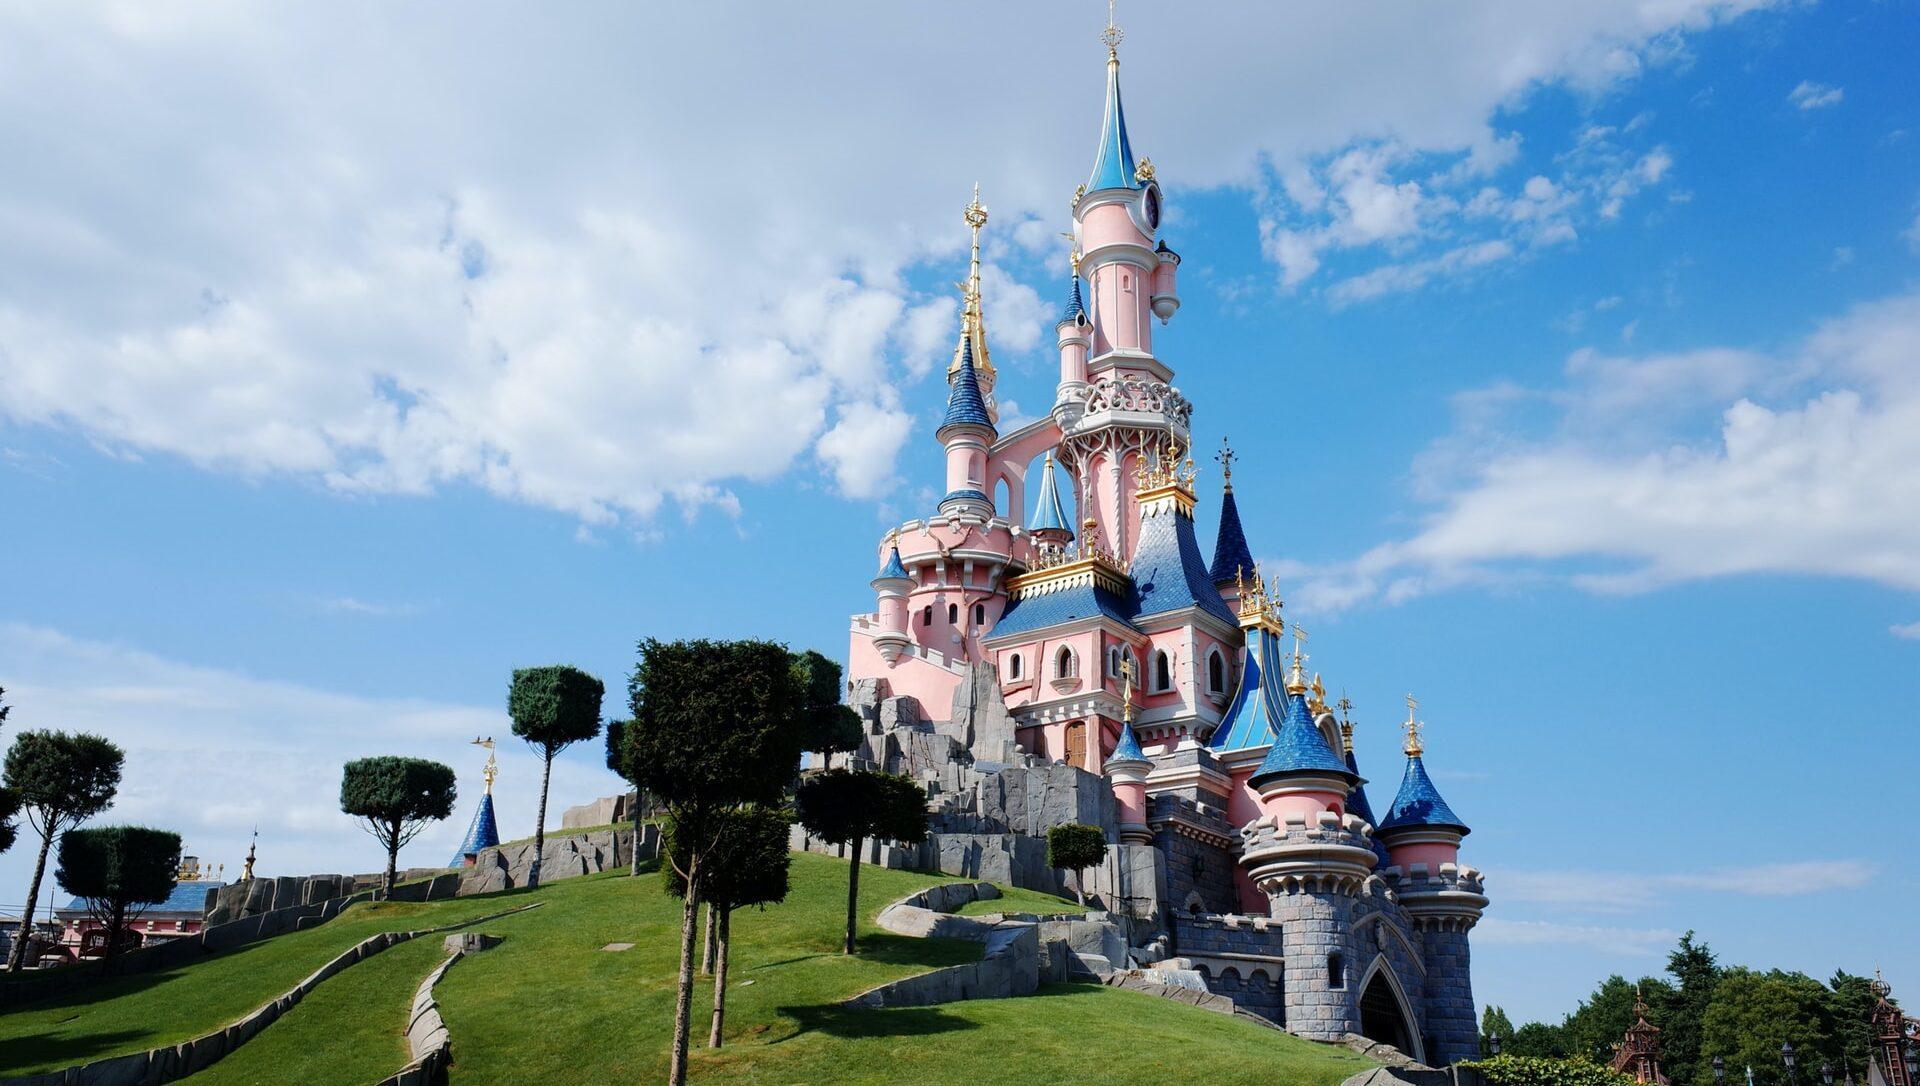 Disneyland Paris 2022